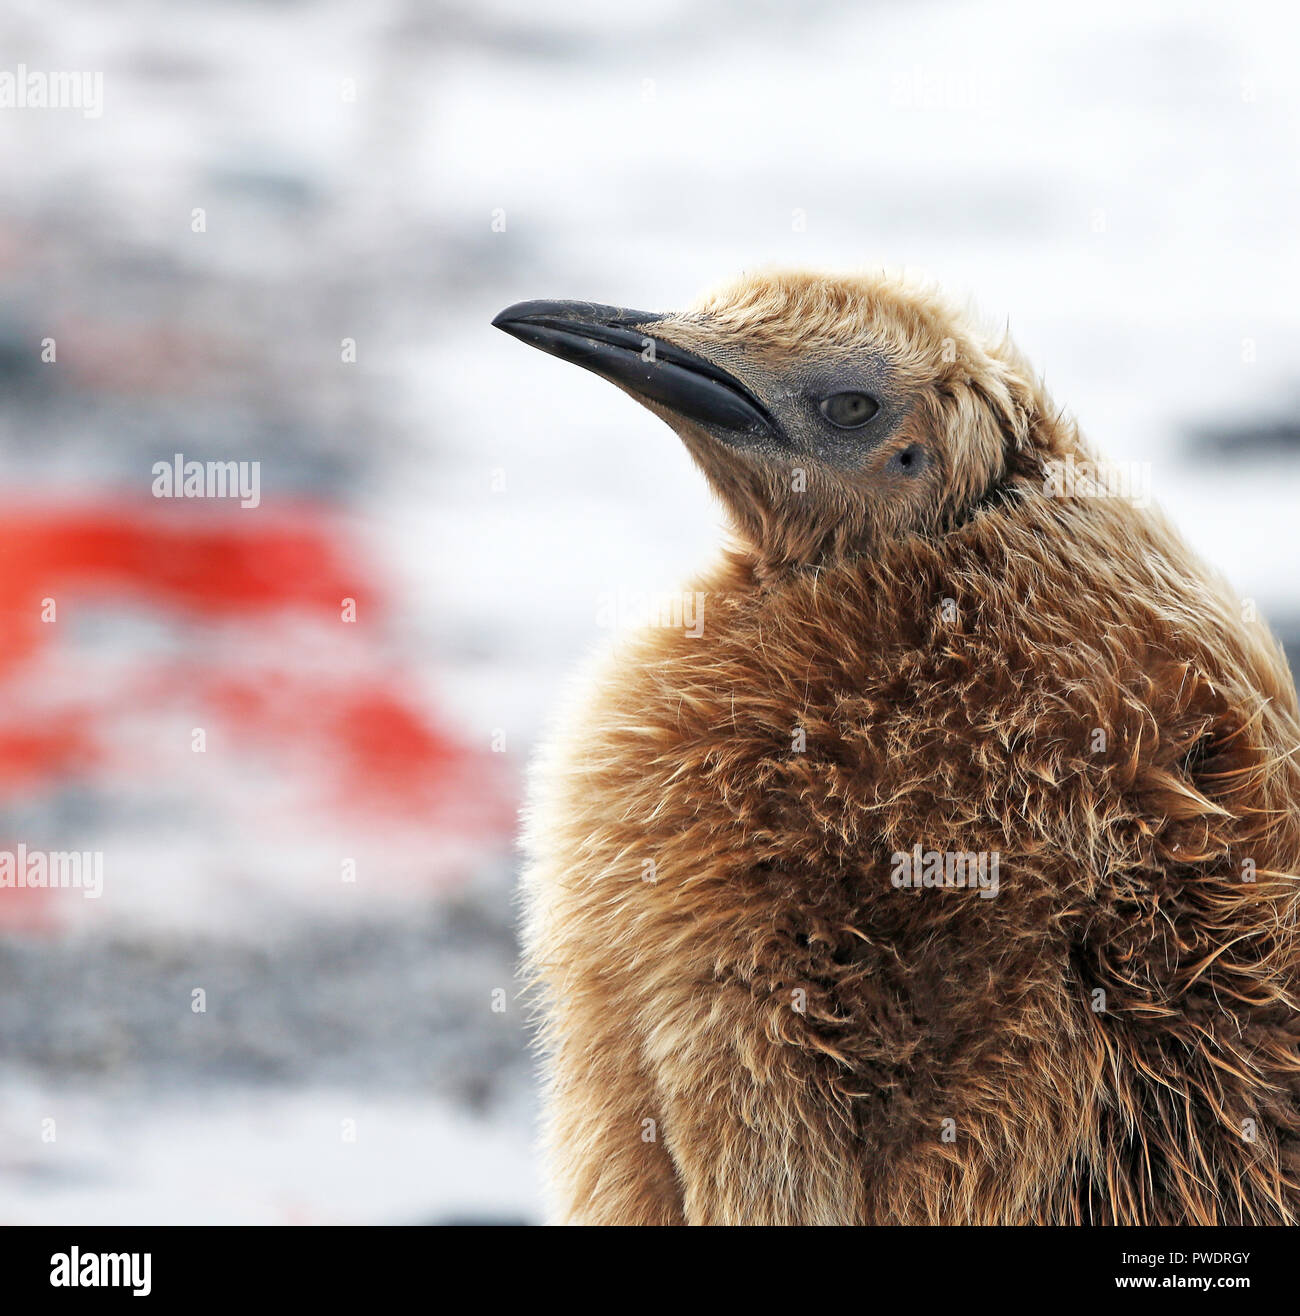 closeup of 'Oakum Boy' in juvenile brown plumage, King Penguin - Stock Image